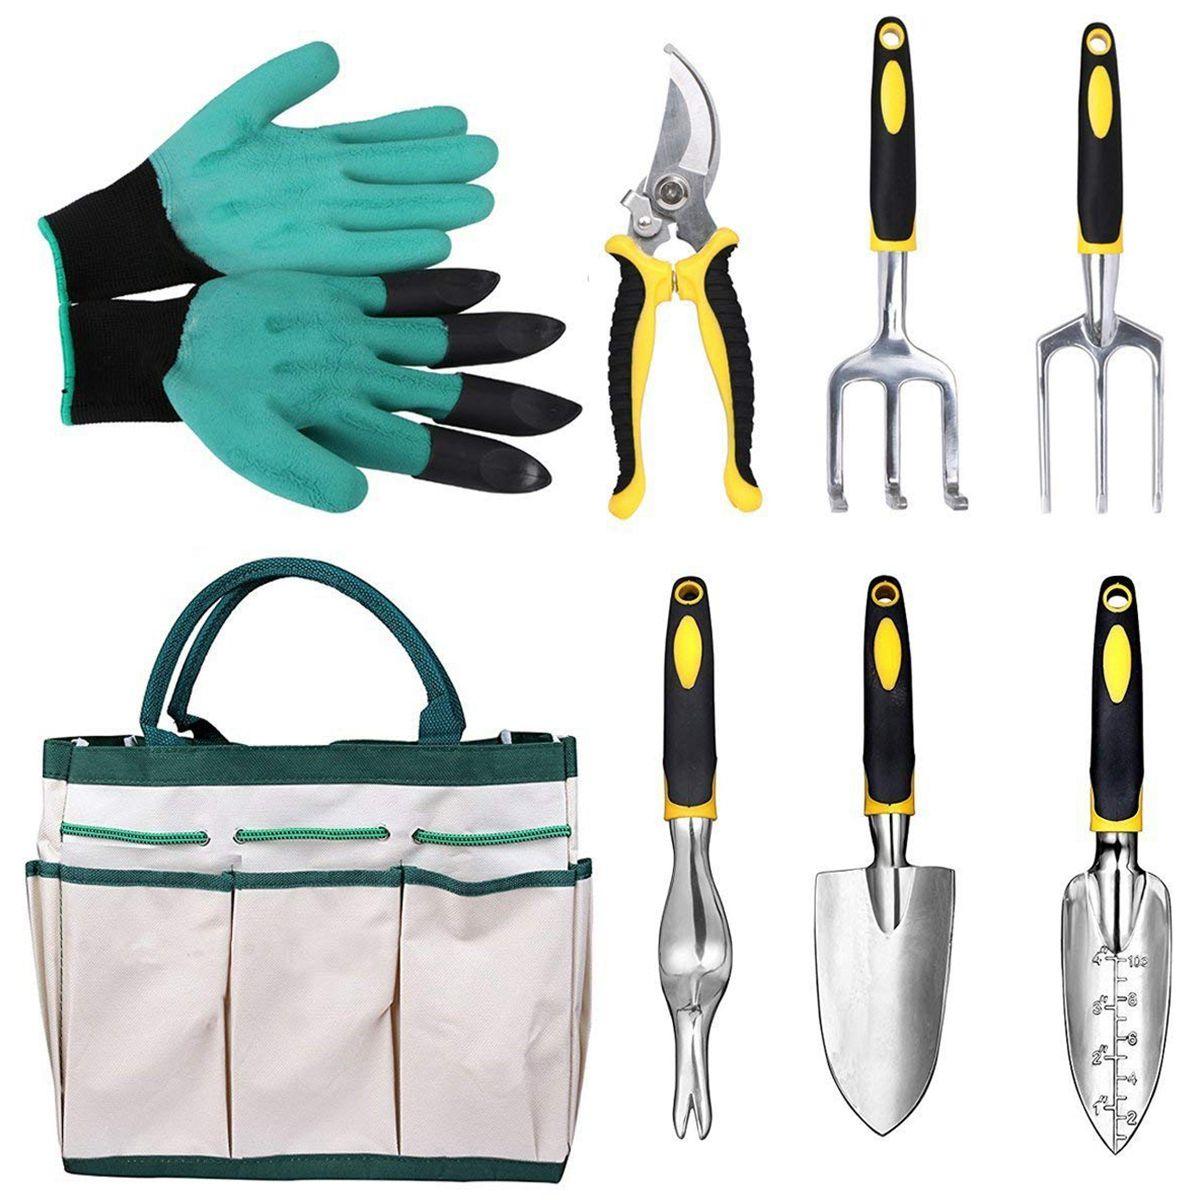 8pcs Aluminum Garden Tools set Garden Kit Mini Spade Shovel Harrow Scissors Grafting Tool Pruners Garden Genie Gloves with bag